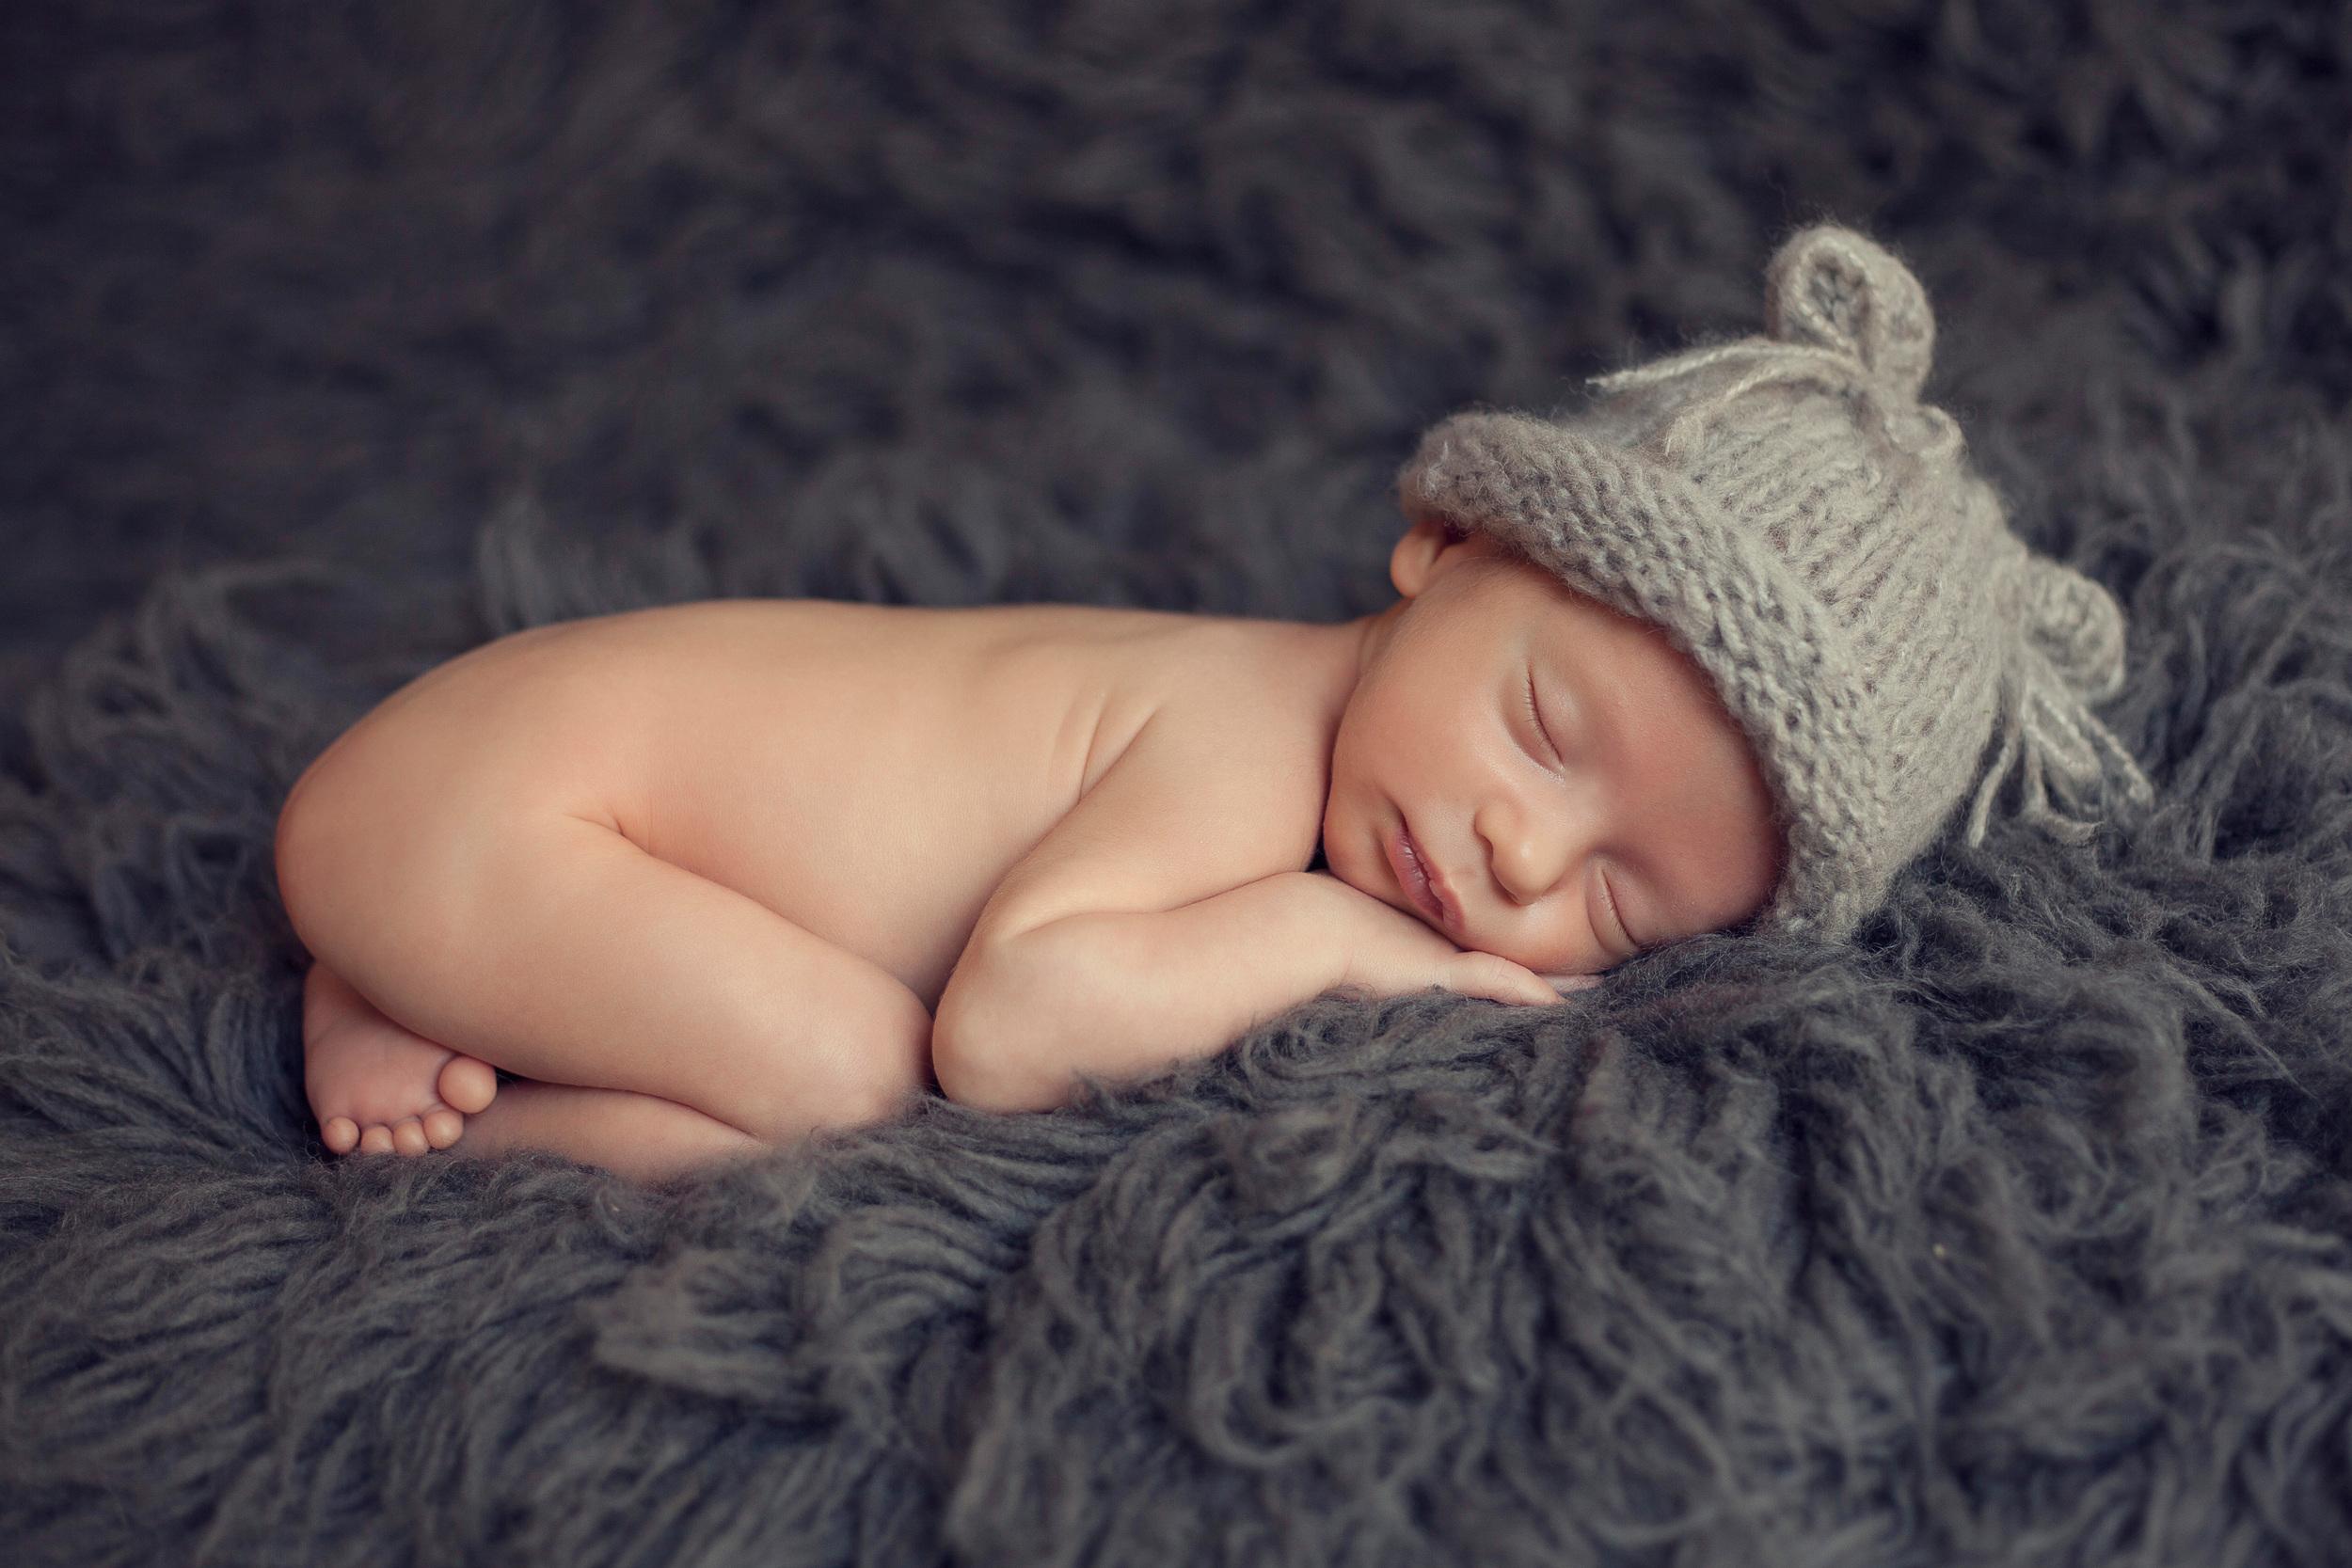 adorable tiny baby boy sleeping on grey flokati wearing kitten hat